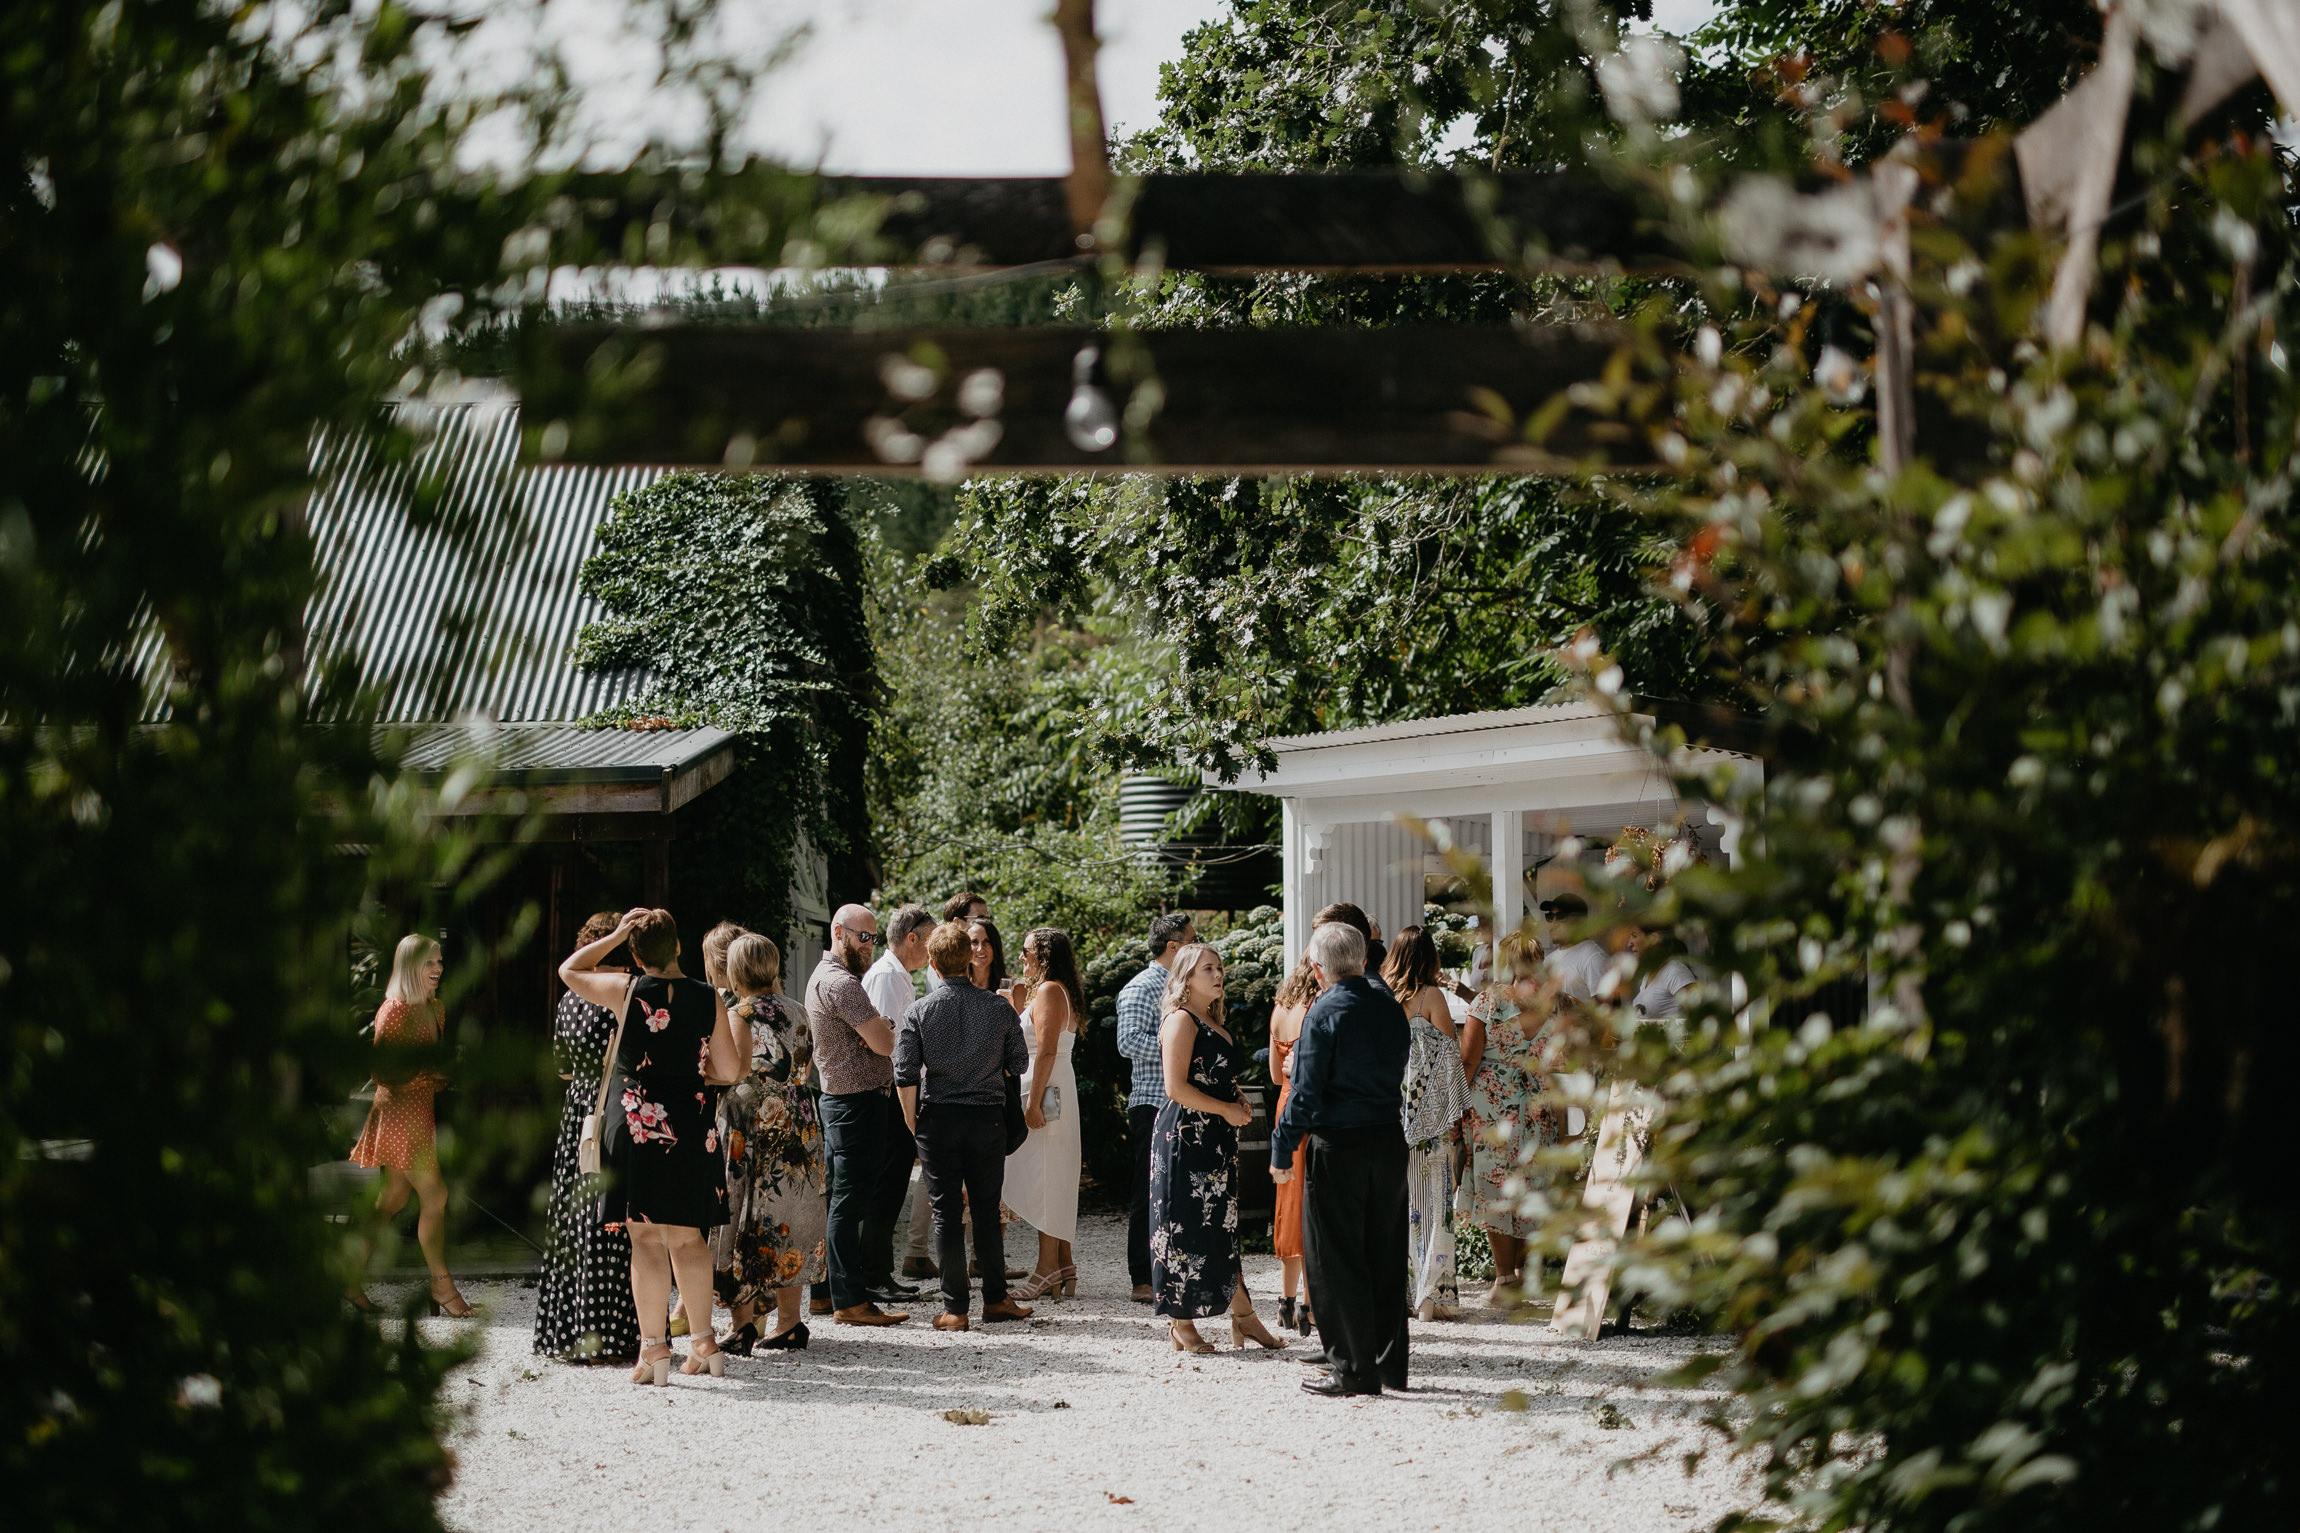 oldforestschool-wedding-blog-121.jpg